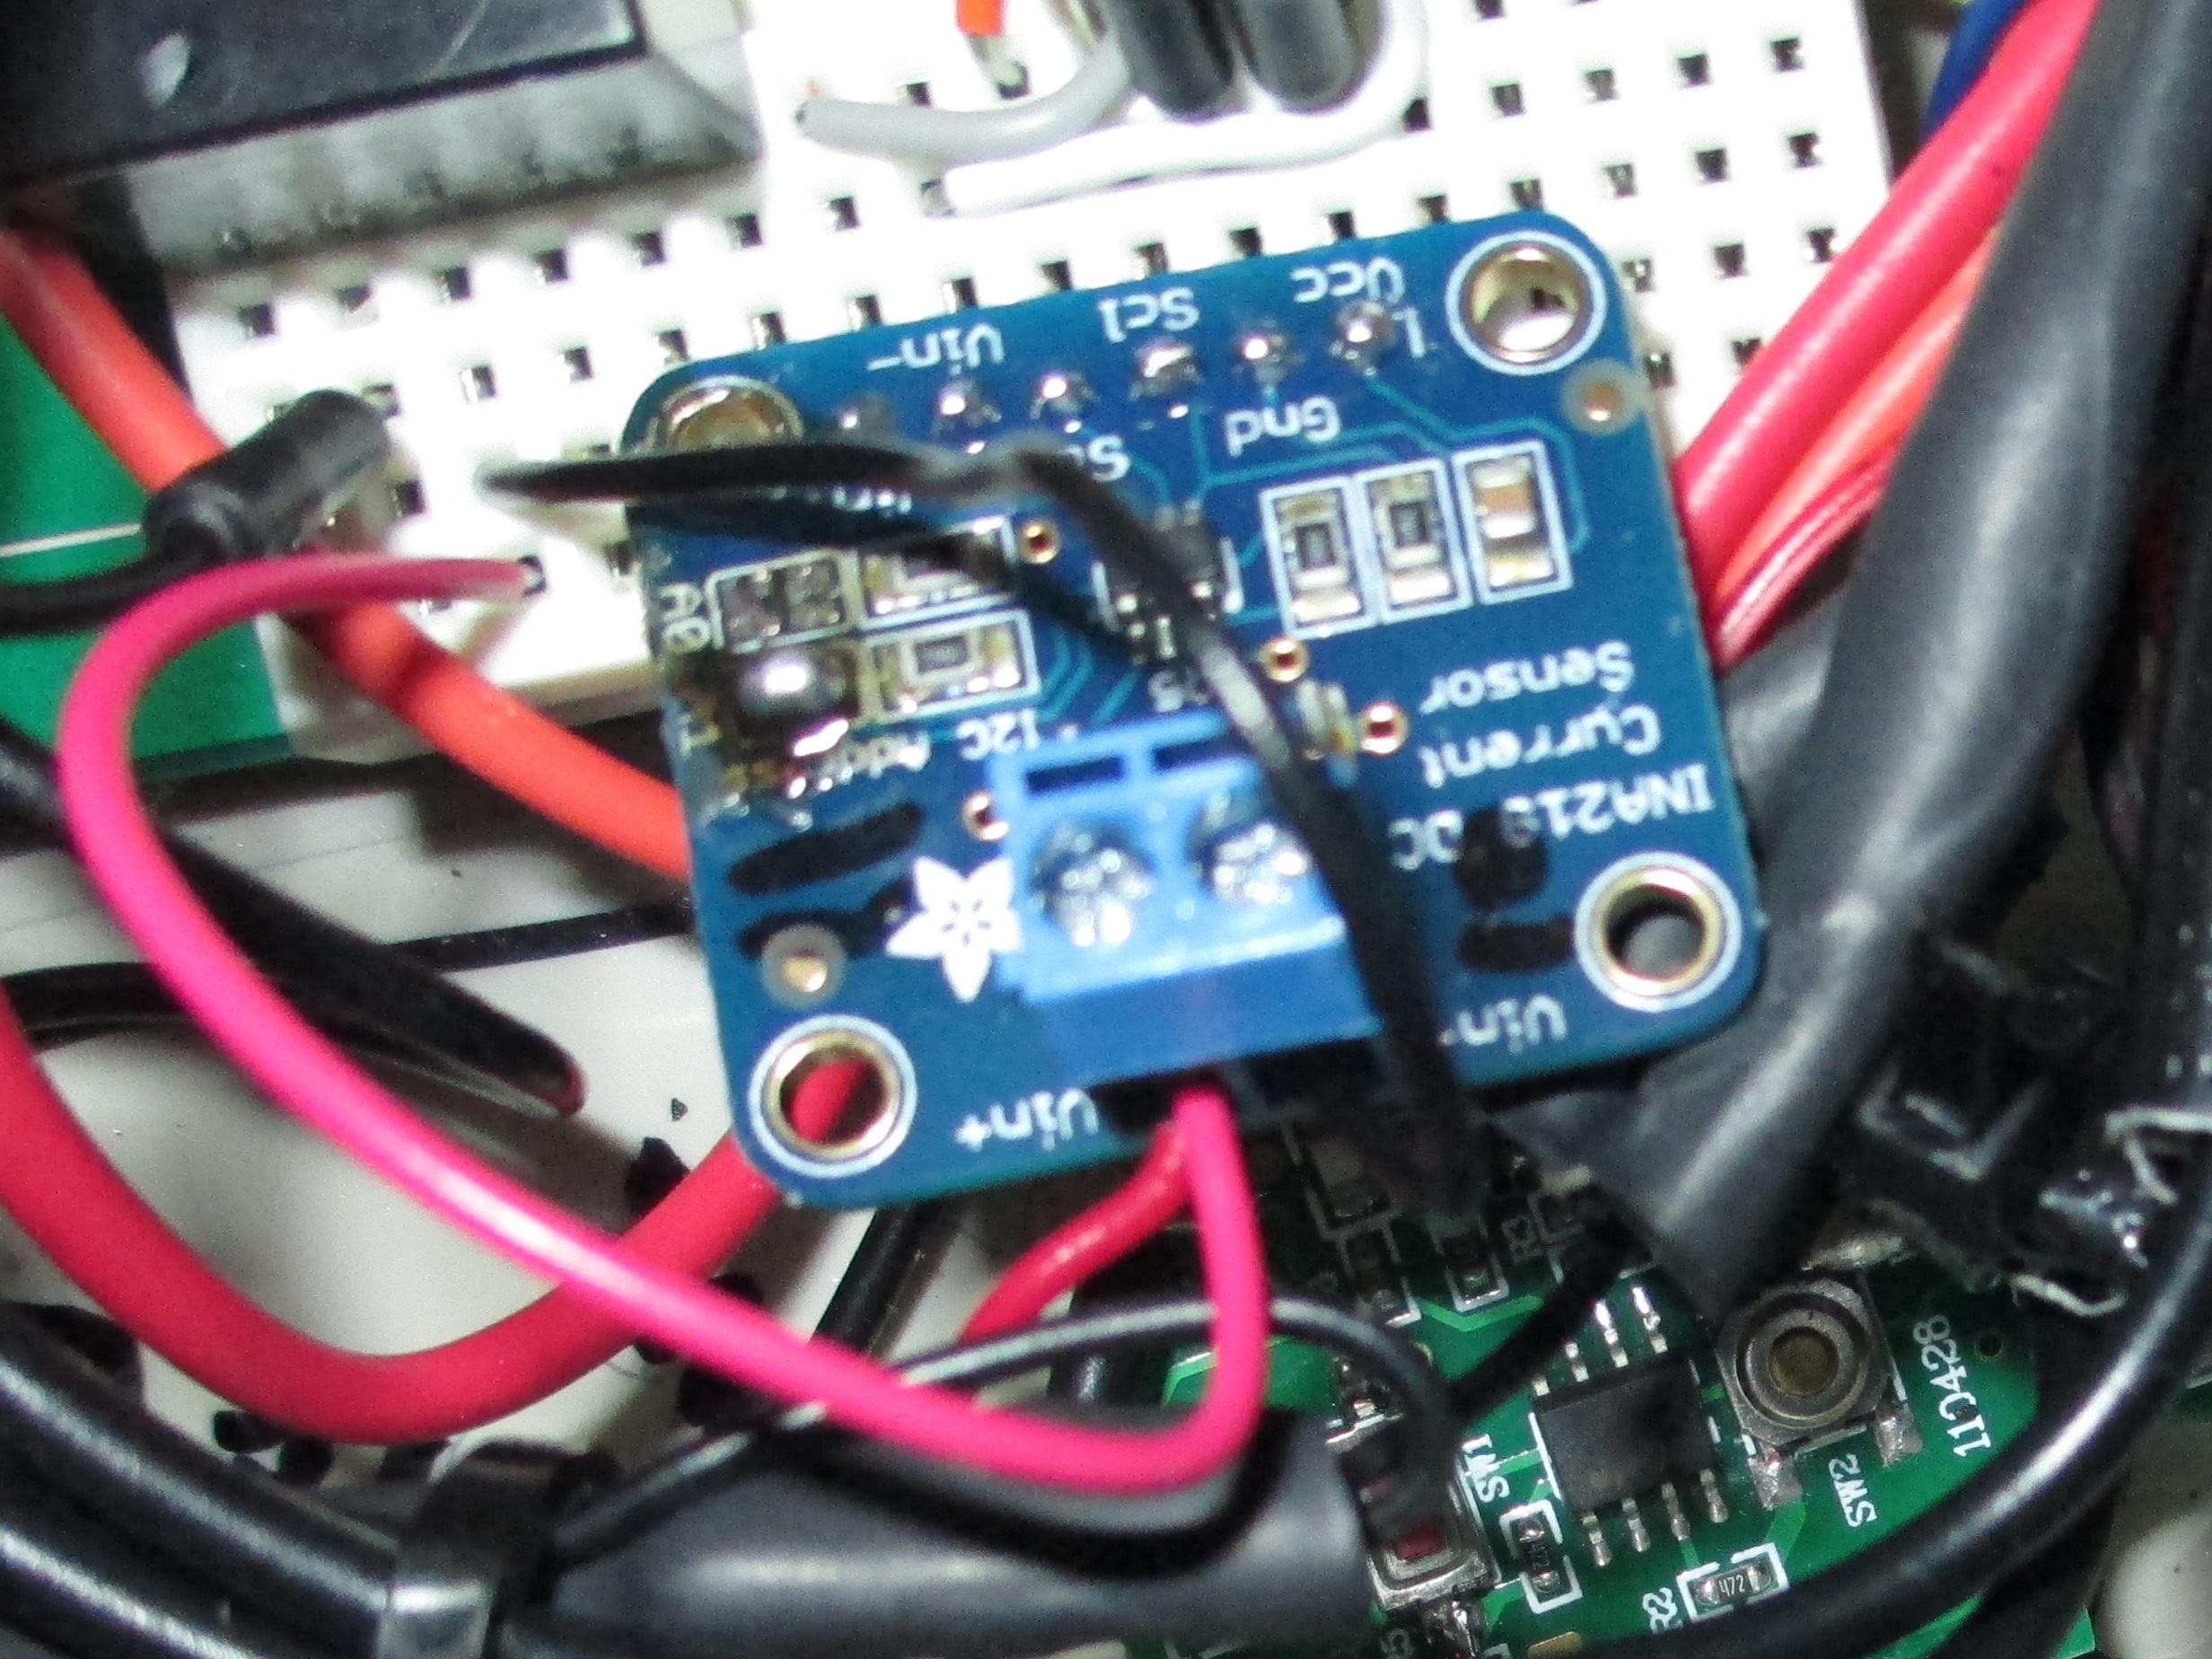 Cycling Champion Generator Control Module Useing Bs2 Detect 12v 4000 Watt Wiring 2464 X 1848 1m